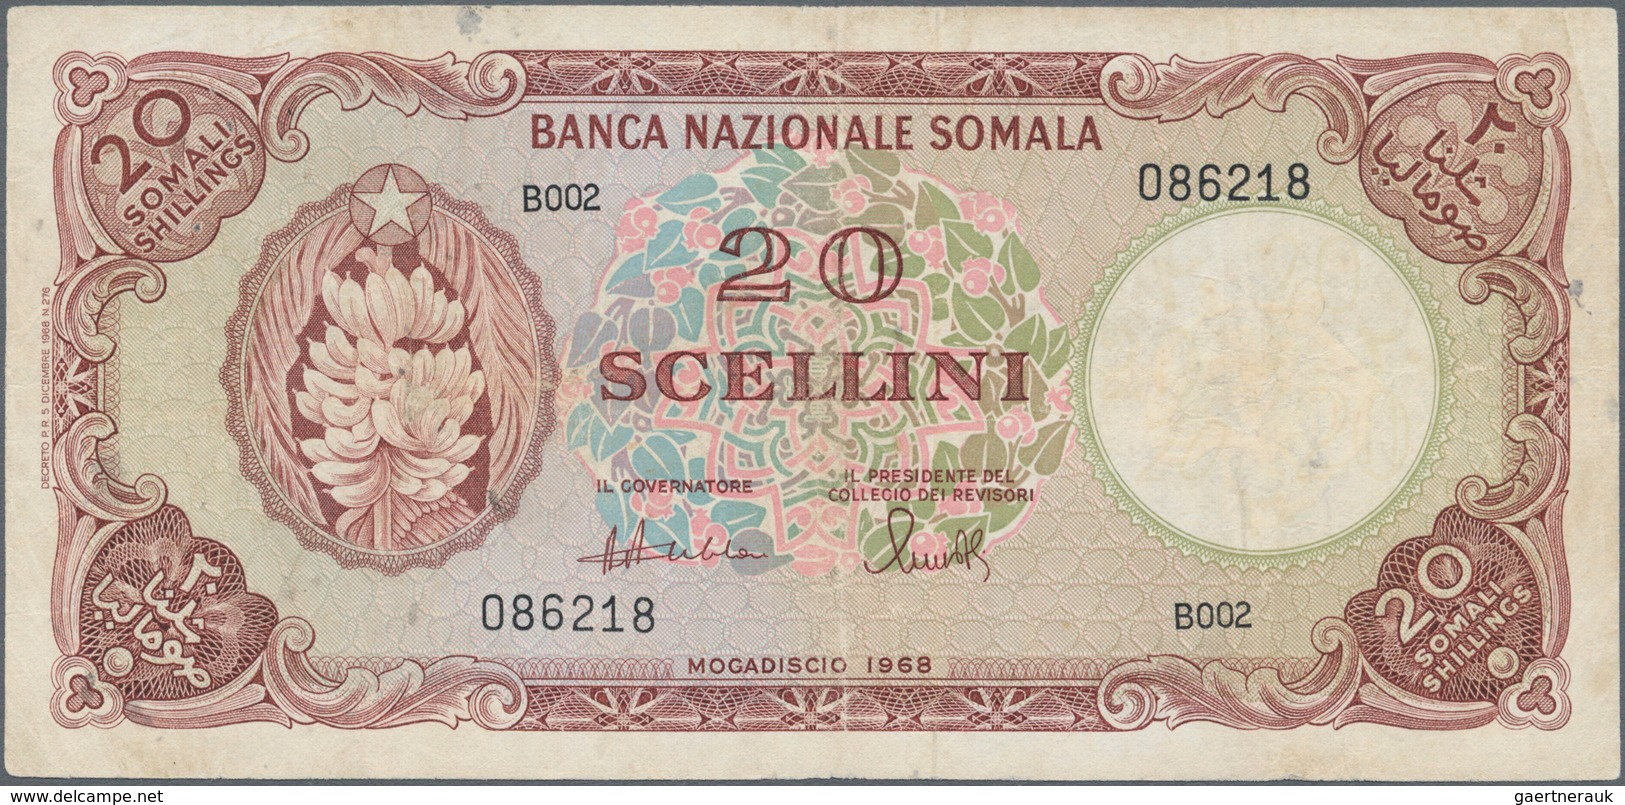 Somalia: Banca Nazionale Somala 20 Scellini 1968, P.11, Pinholes At Upper Left, Some Folds And Obiou - Somalia